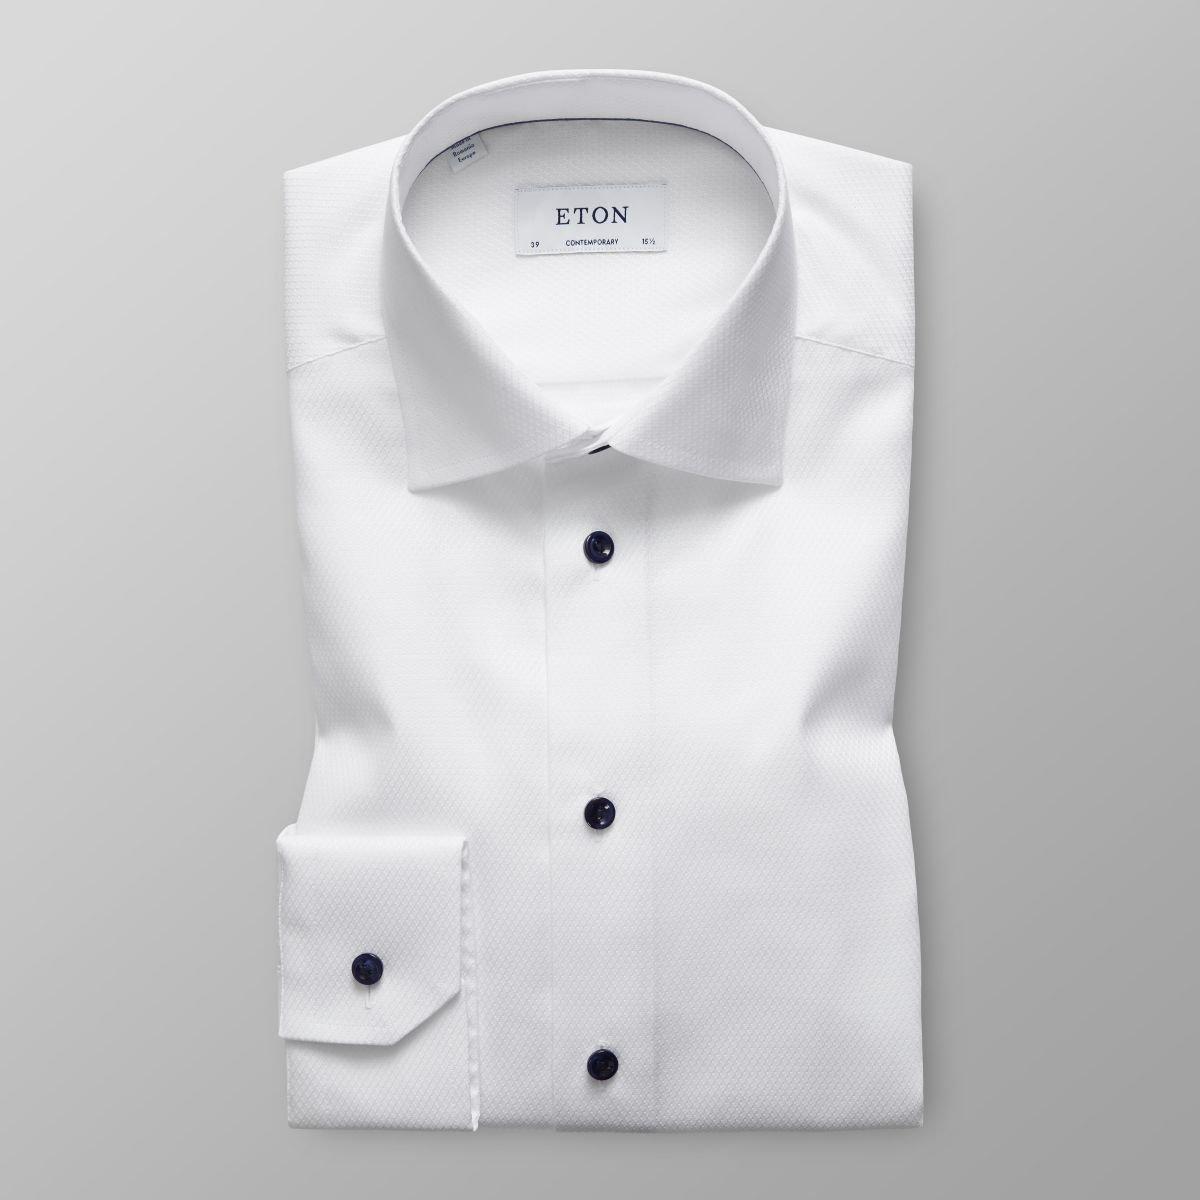 1c73f9fa9a59bf Eton Men's White Twill Blue Buttons Shirt (White, 16) at Amazon Men's  Clothing store: